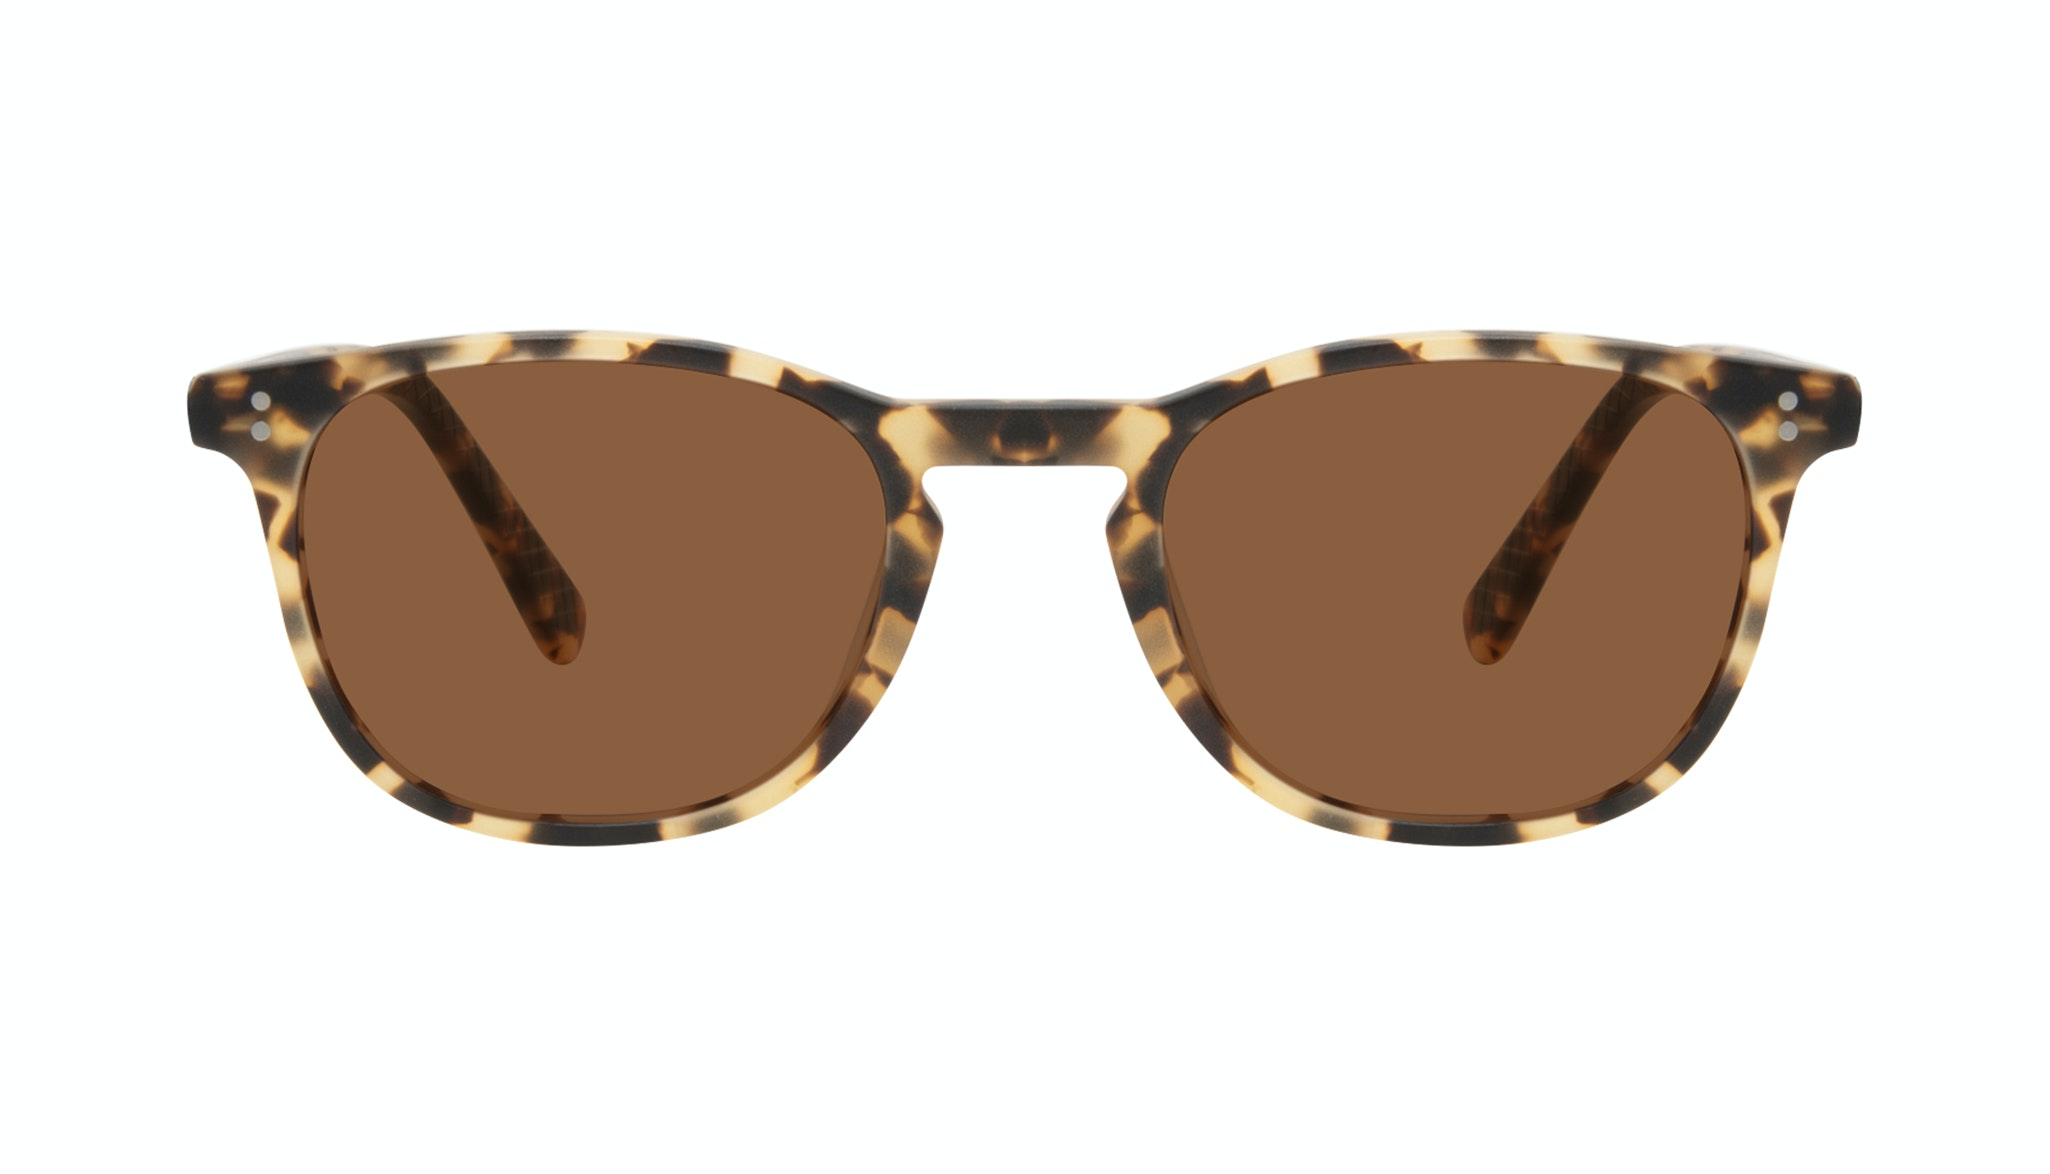 Affordable Fashion Glasses Round Sunglasses Men Trooper Tortoise Matte Front